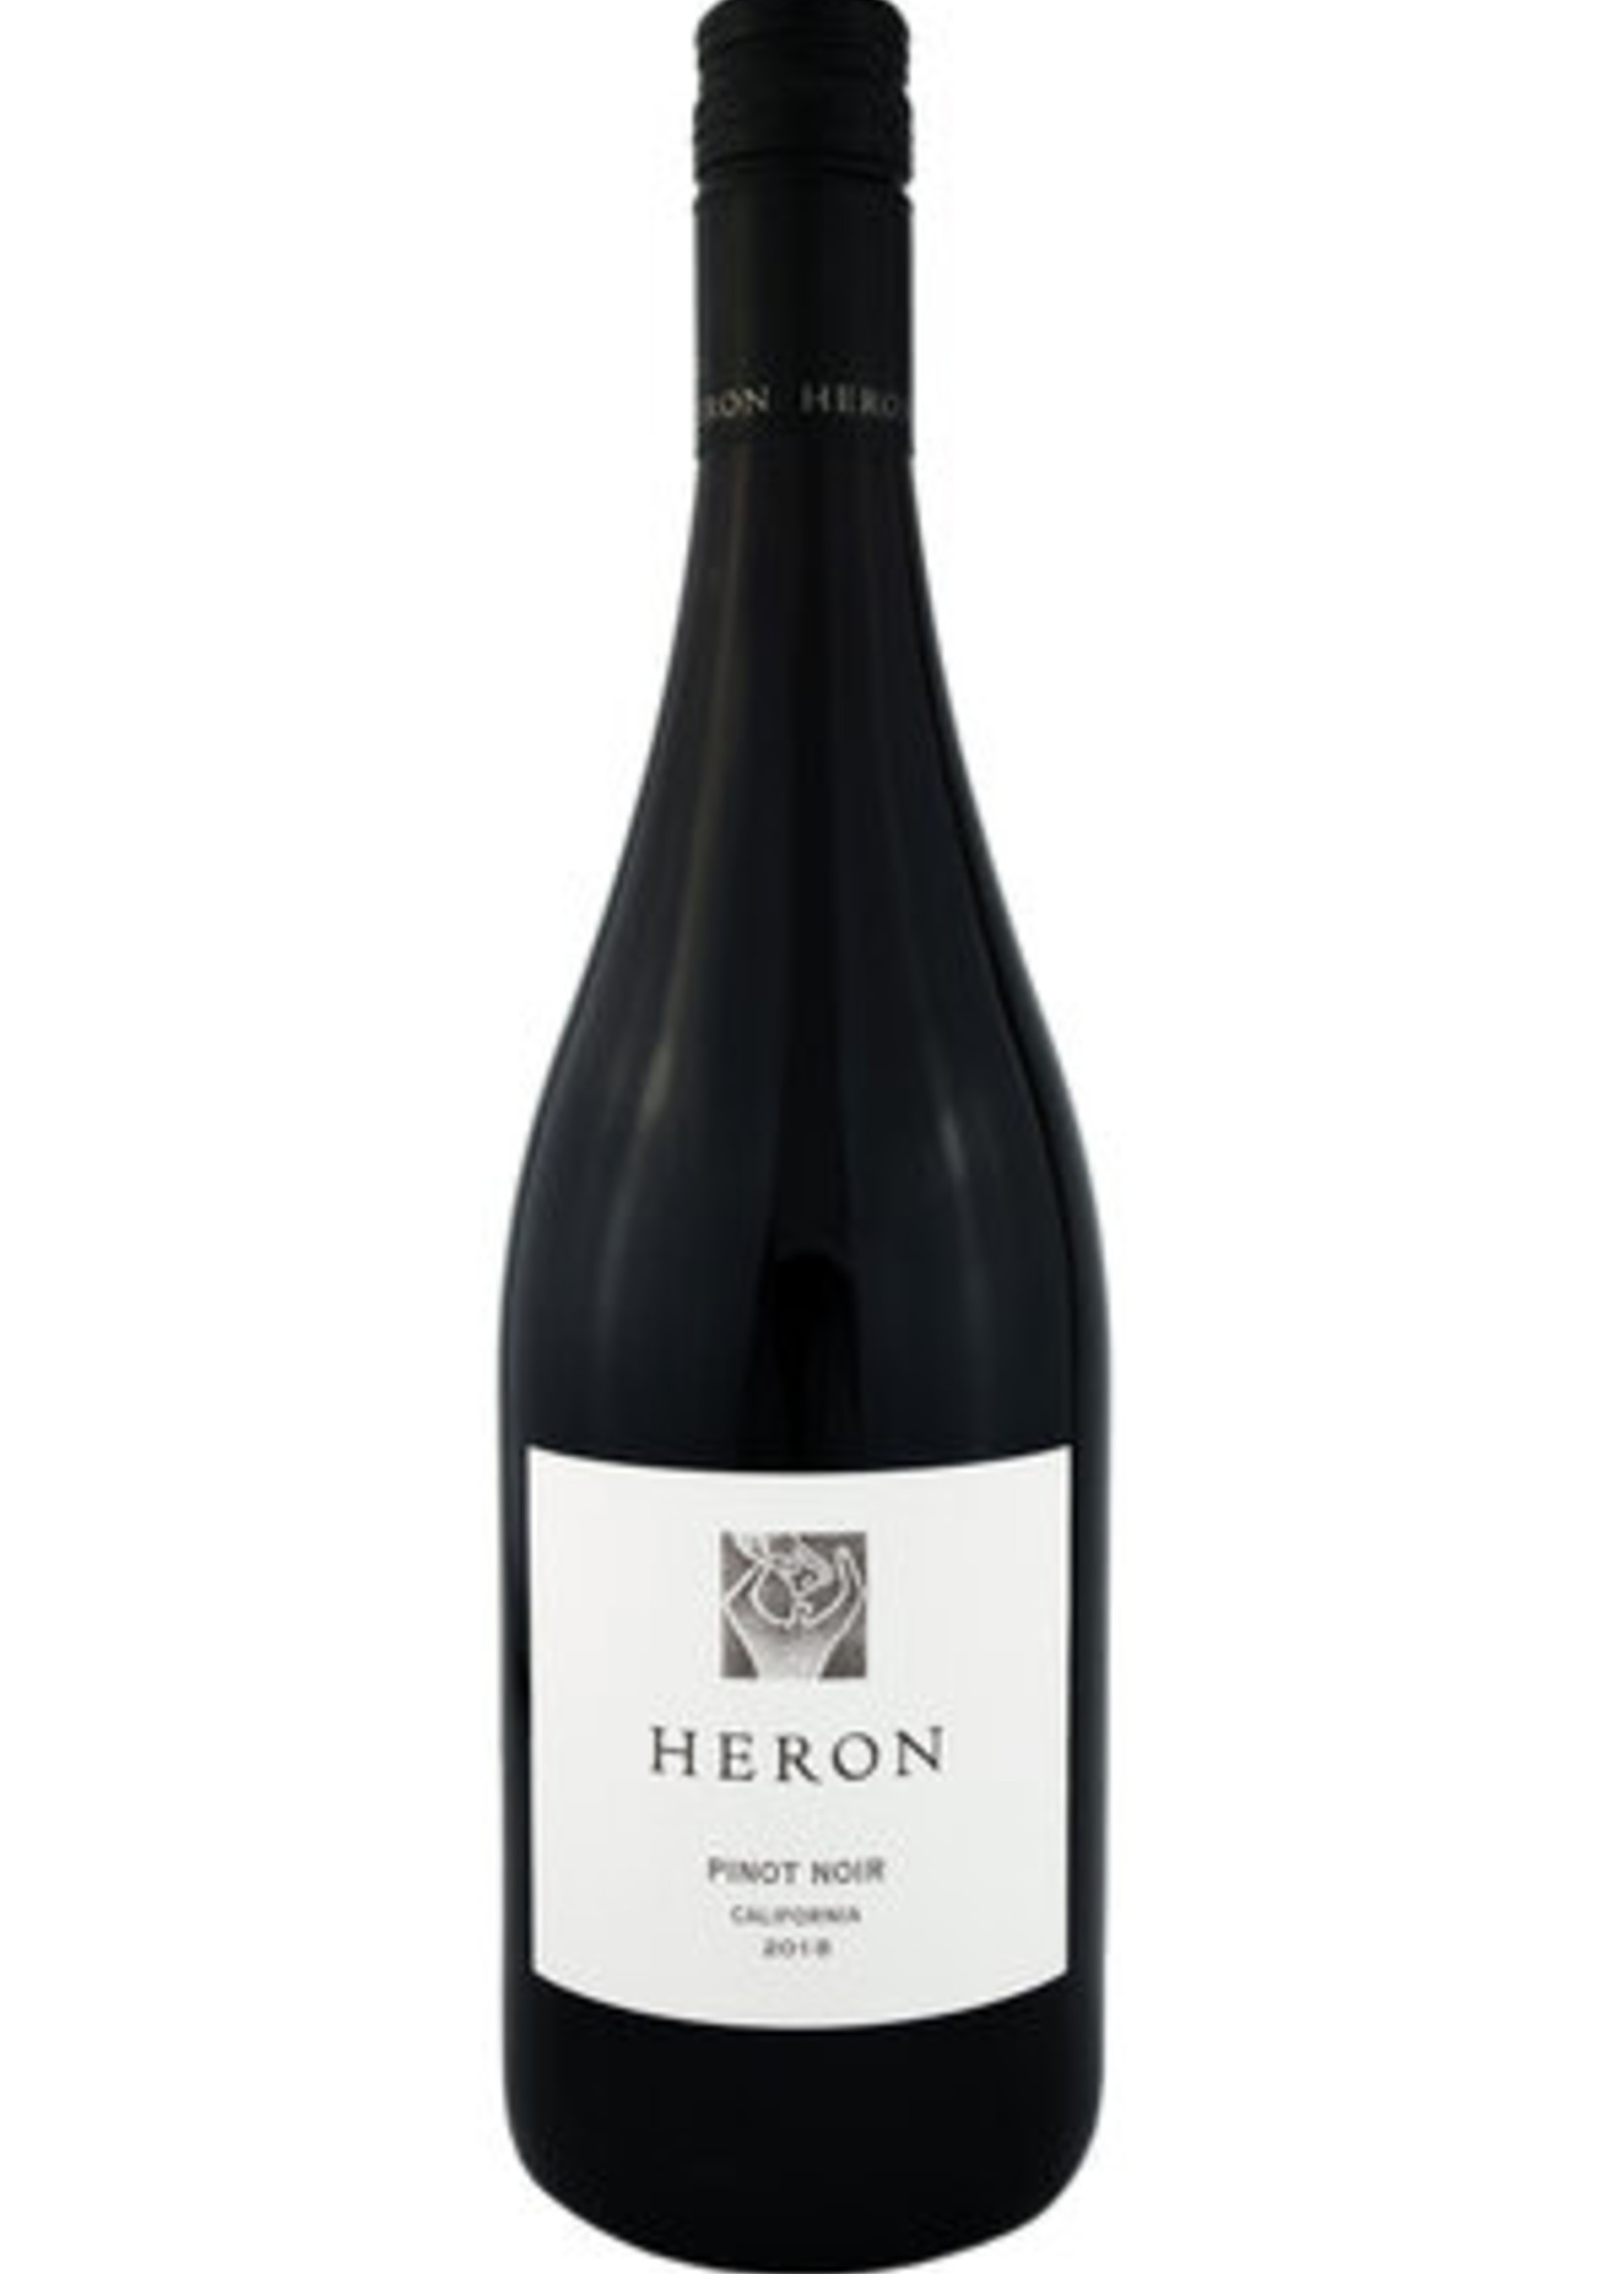 Heron Pinot Noir, CA